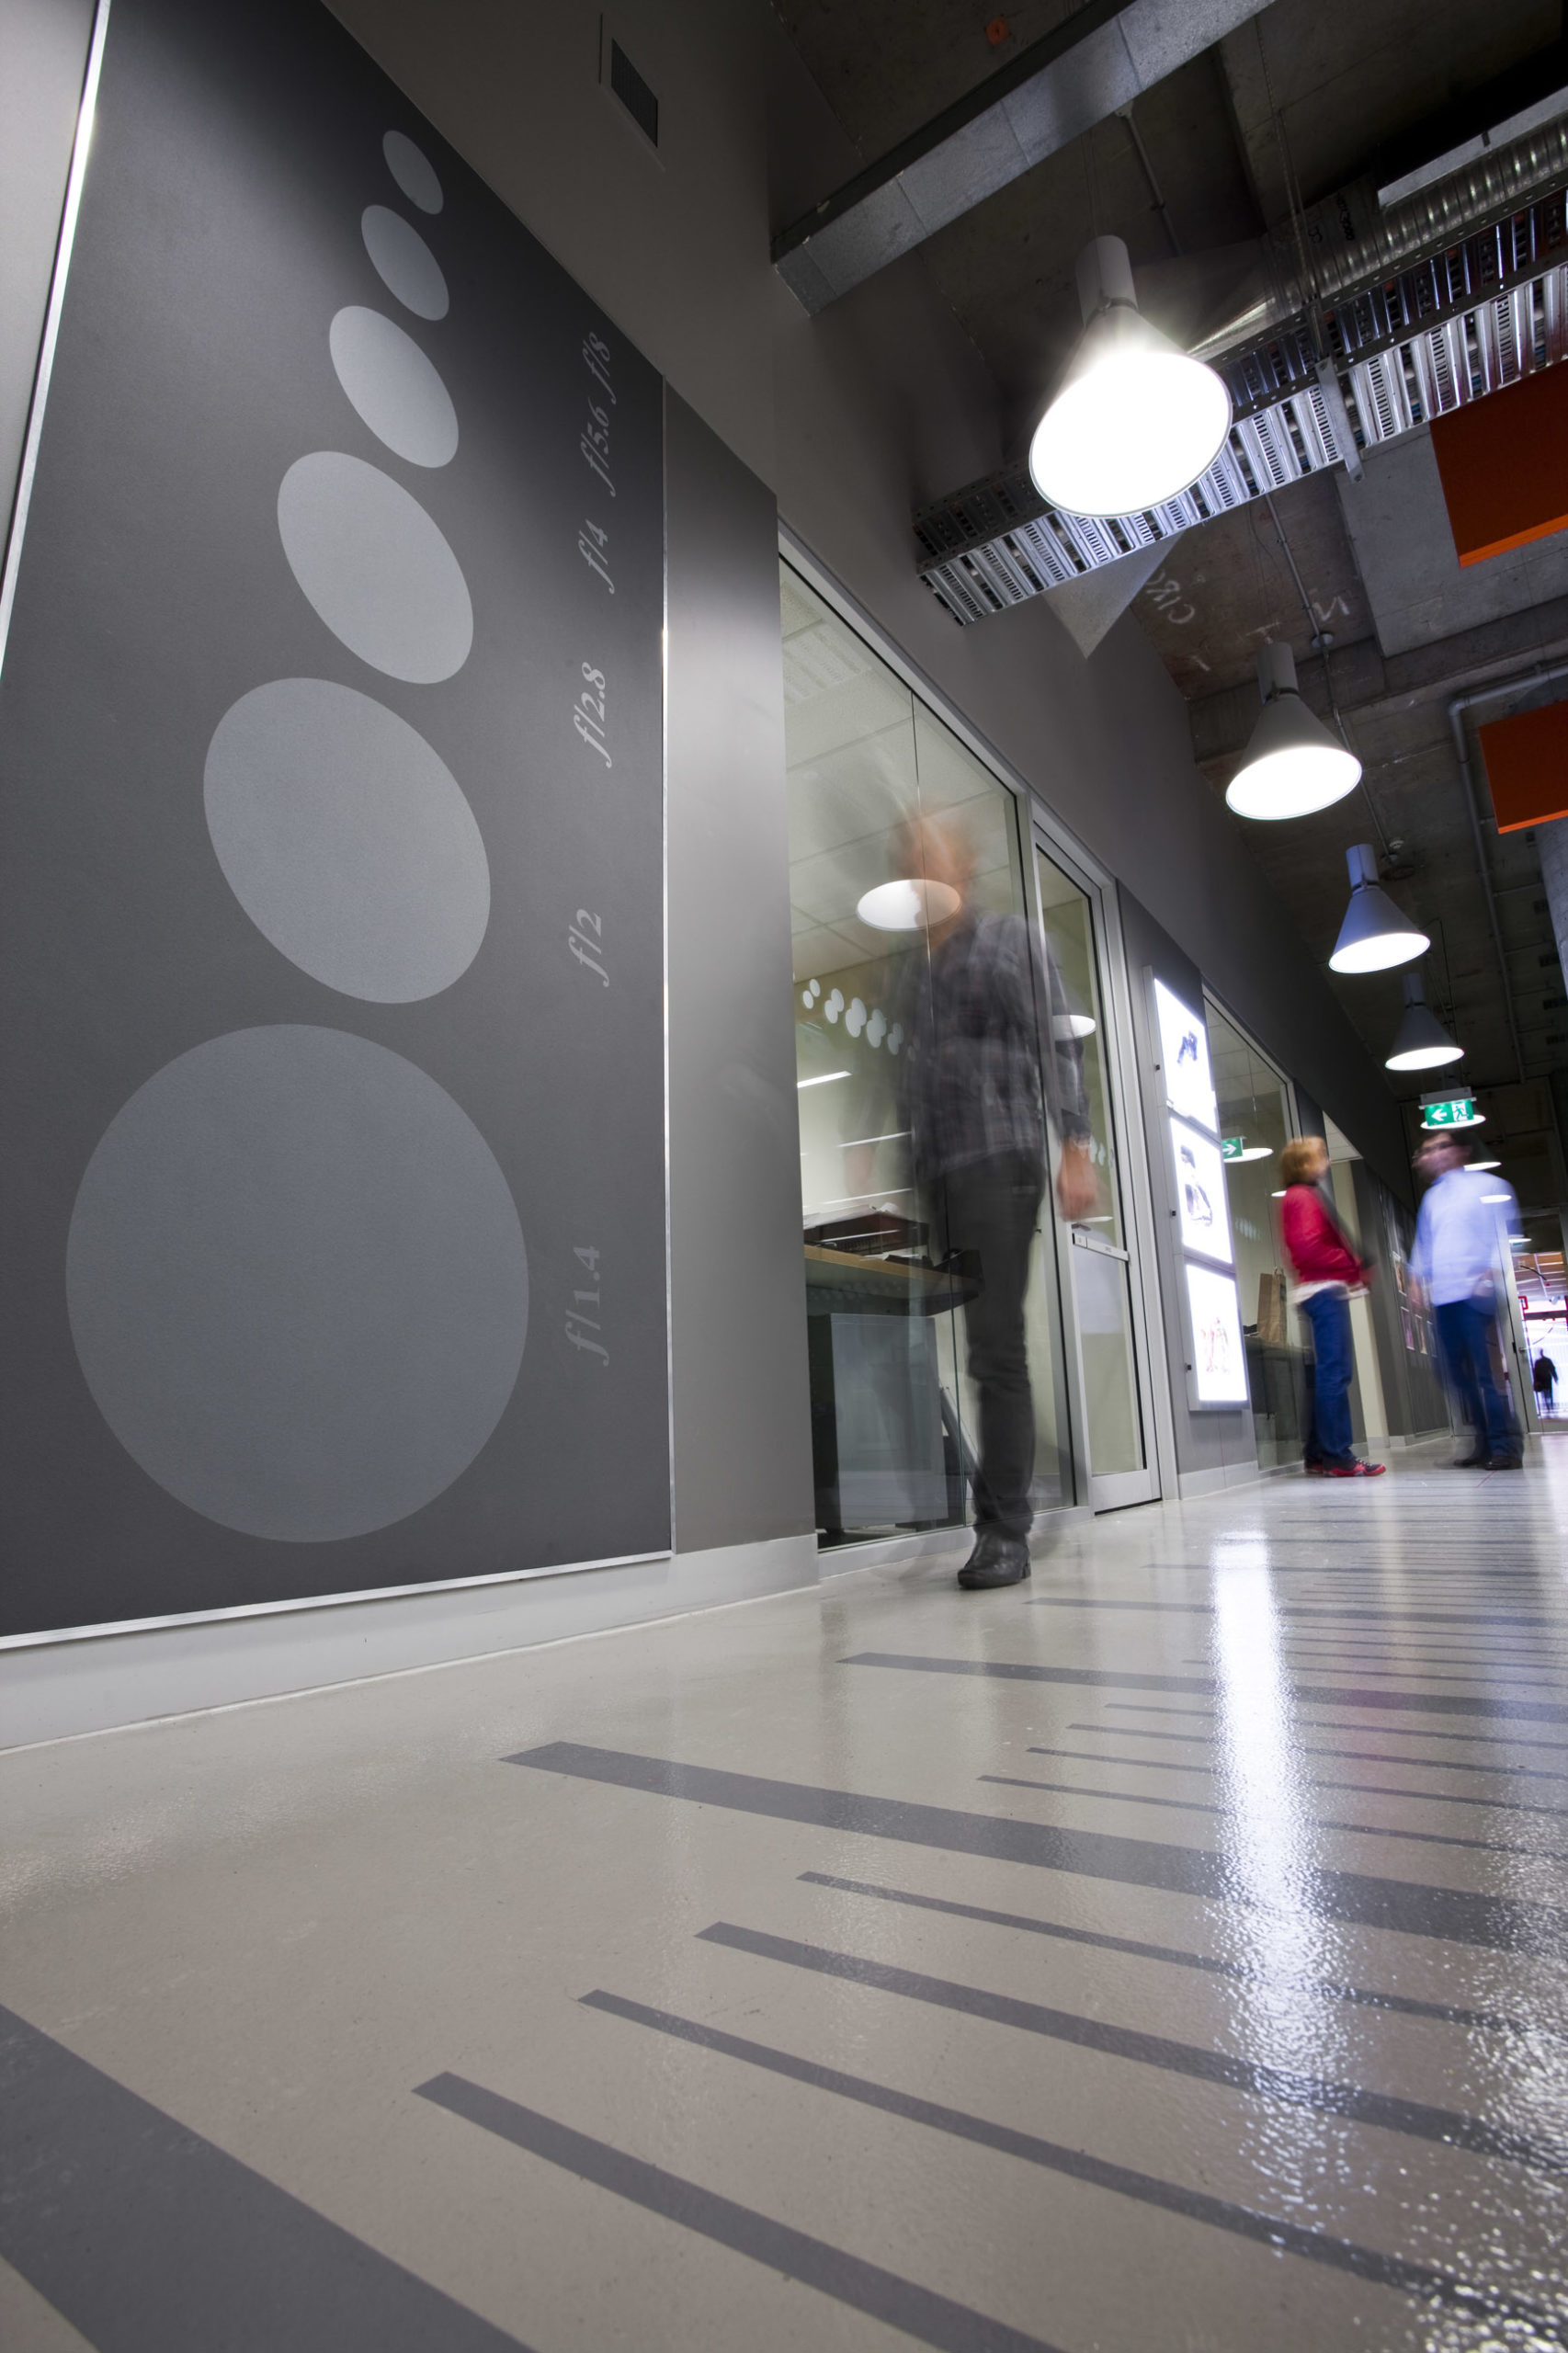 UTS Building 6 DAB Fabrication and Photographic Studio Hallway – Gardner Wetherill GW 6